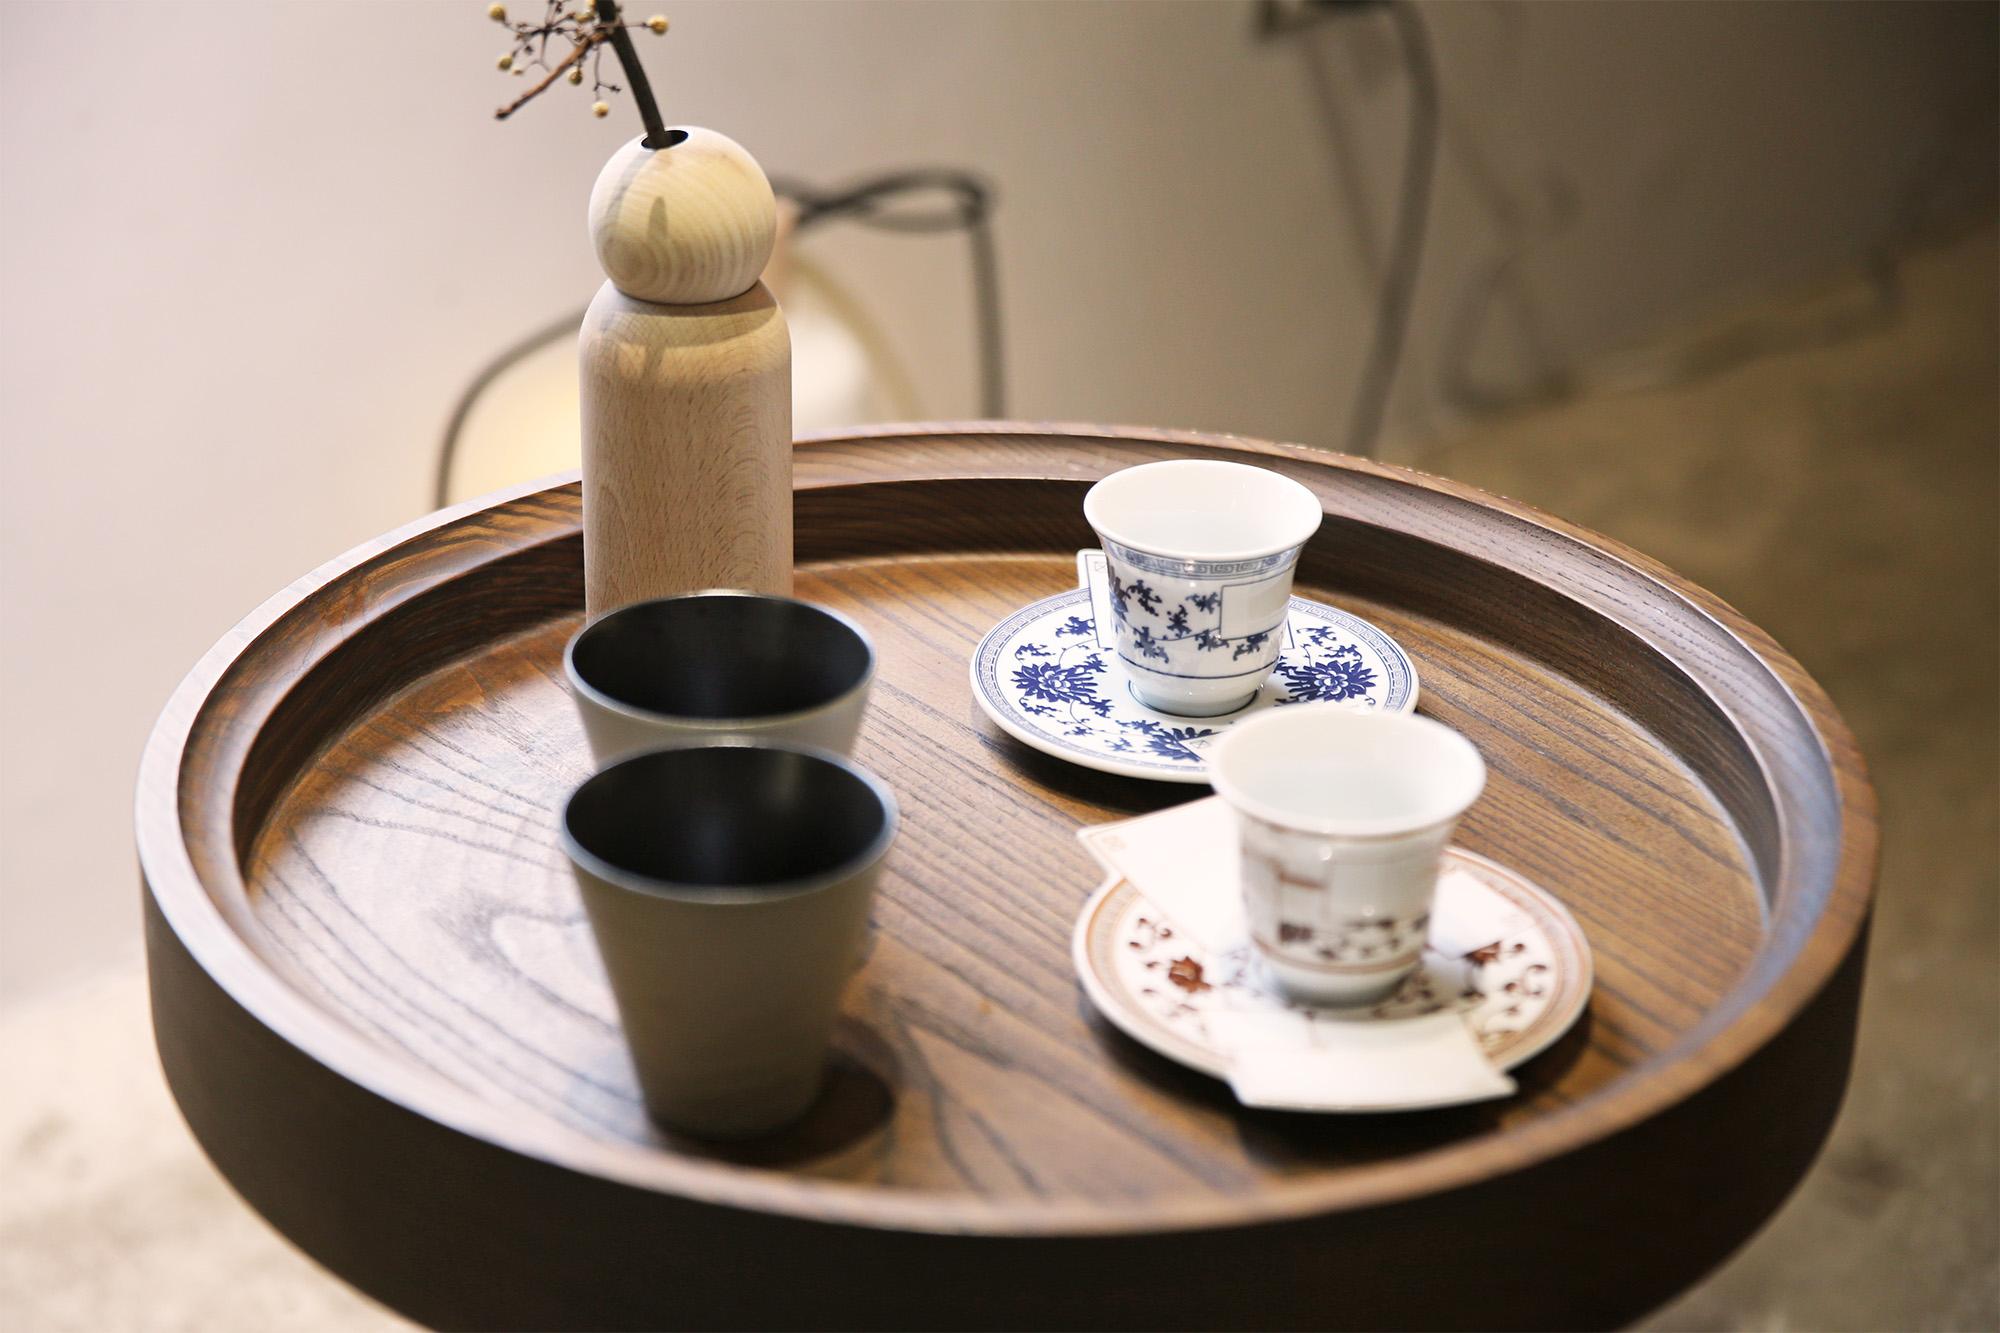 Play Tea Room | 八拾捌茶 x 品茶趣體驗房